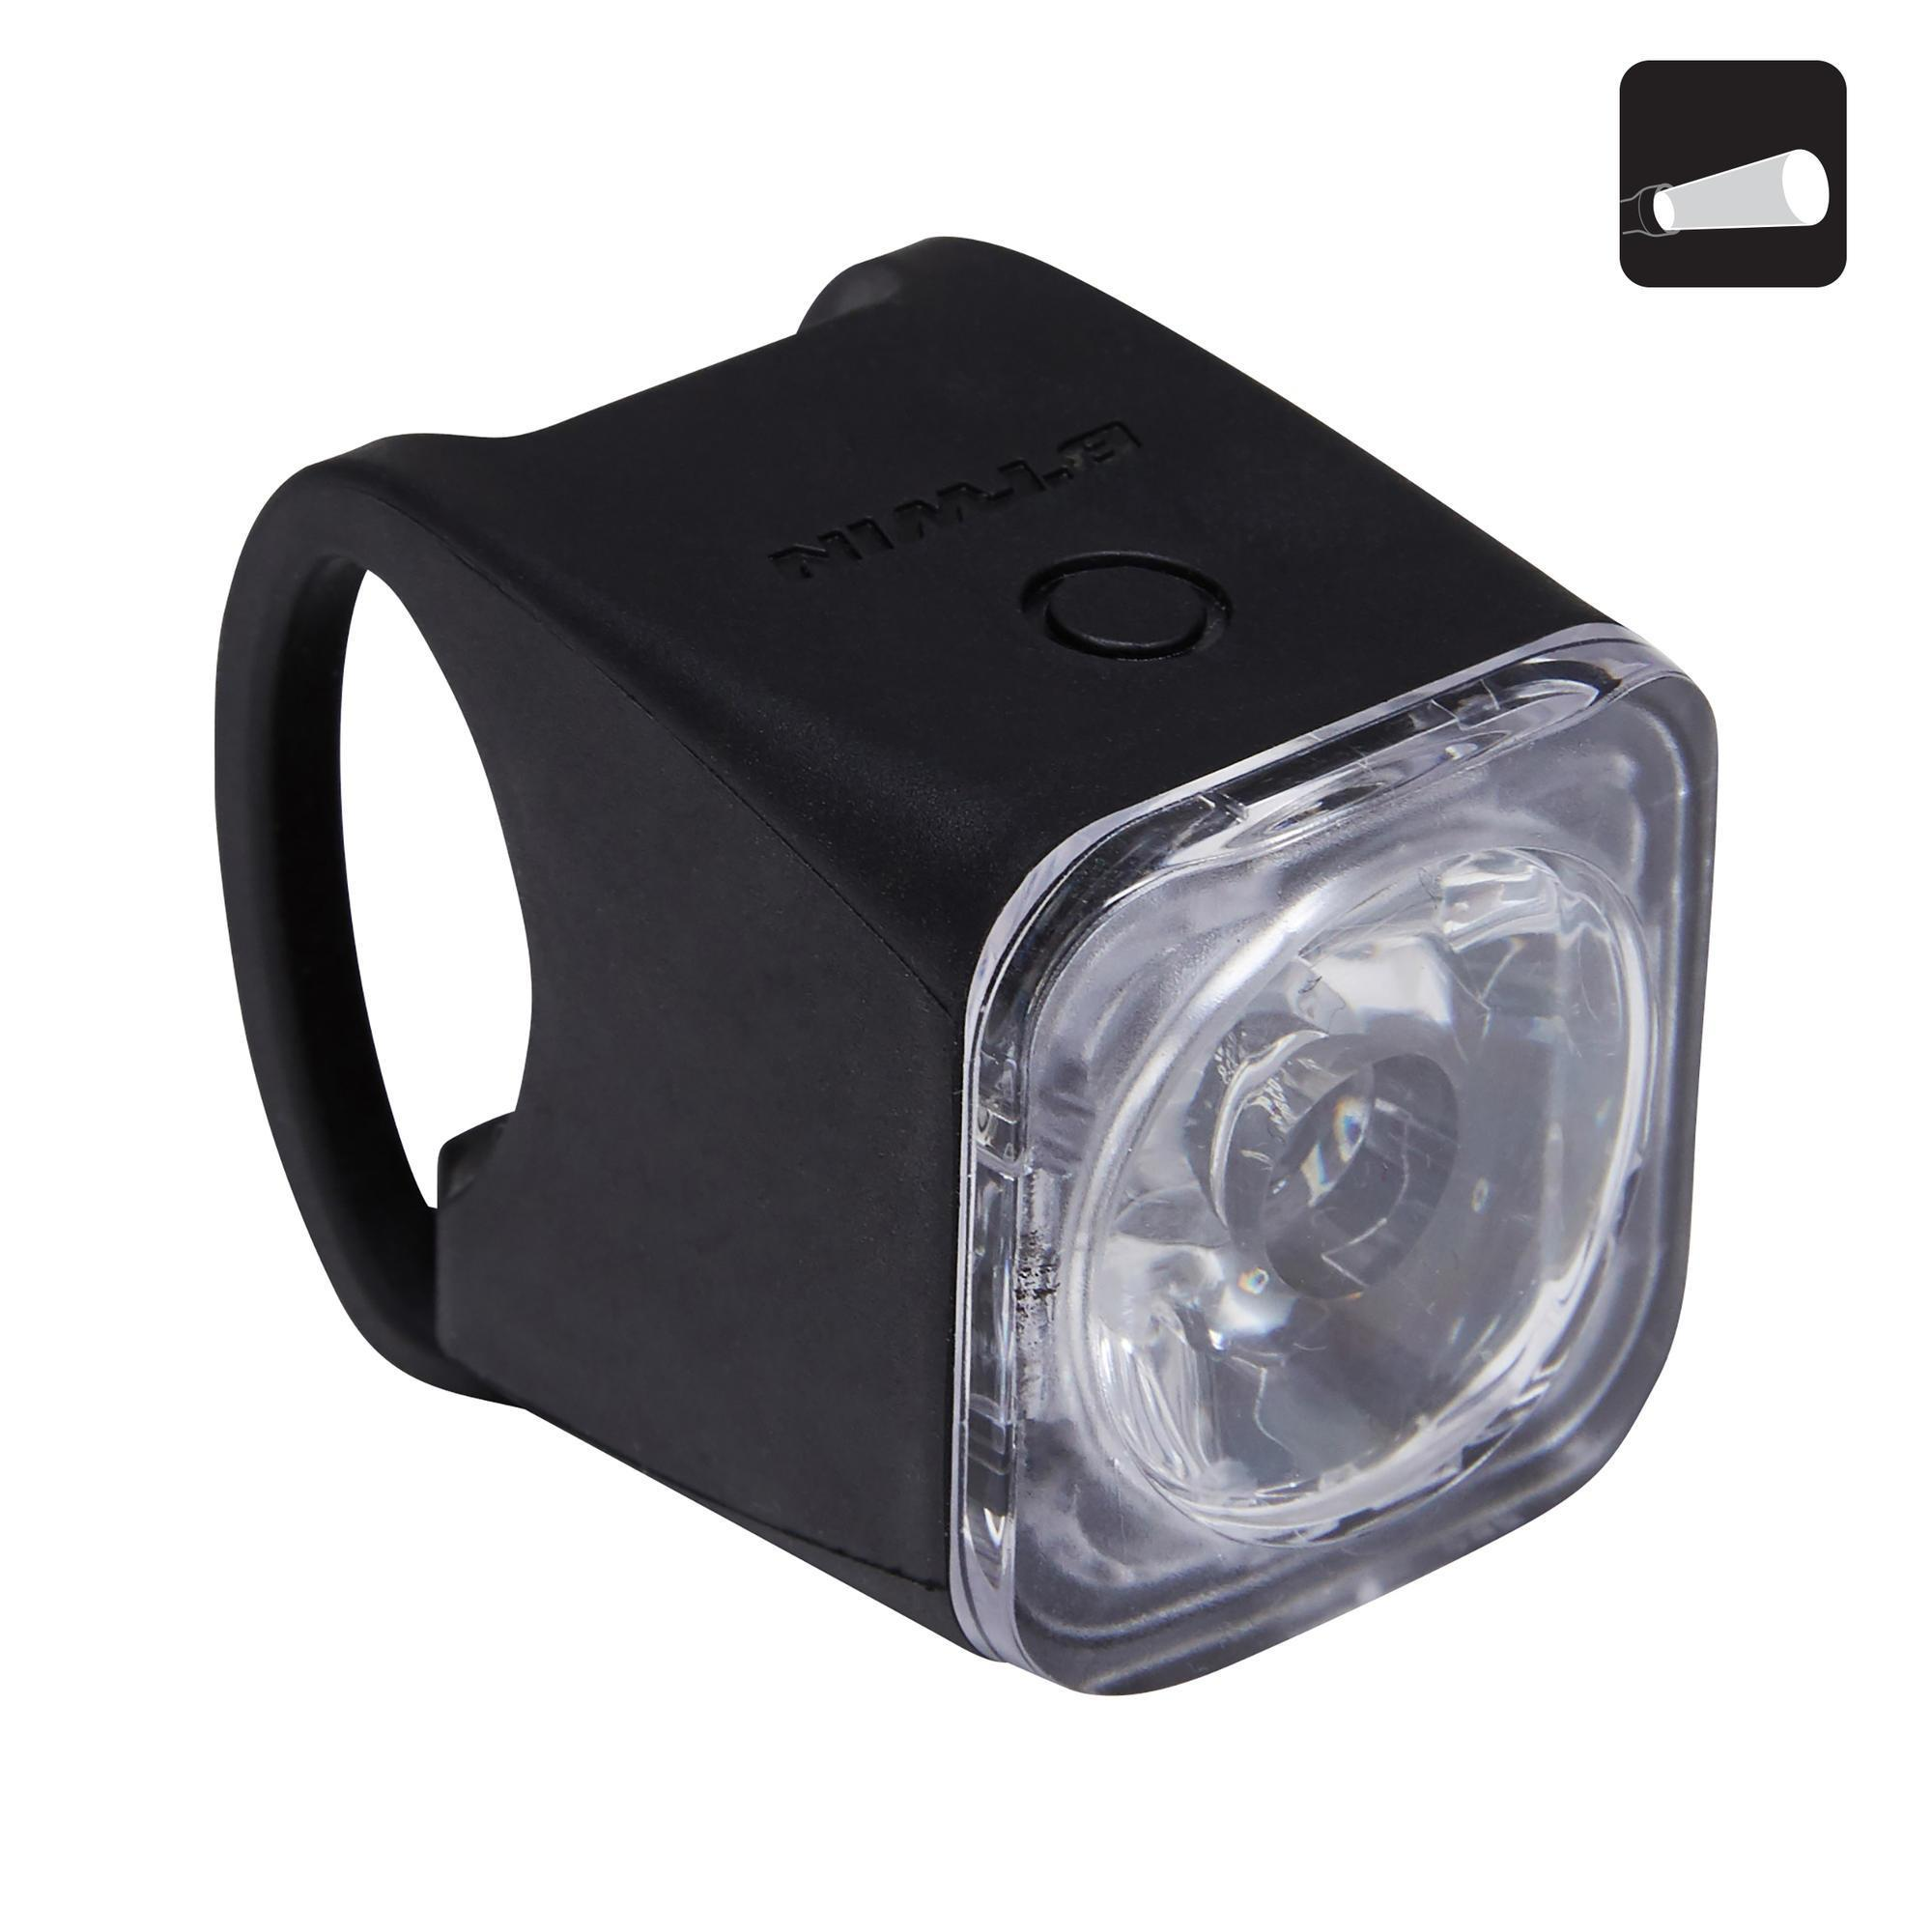 Elops fietslamp USB FL 500